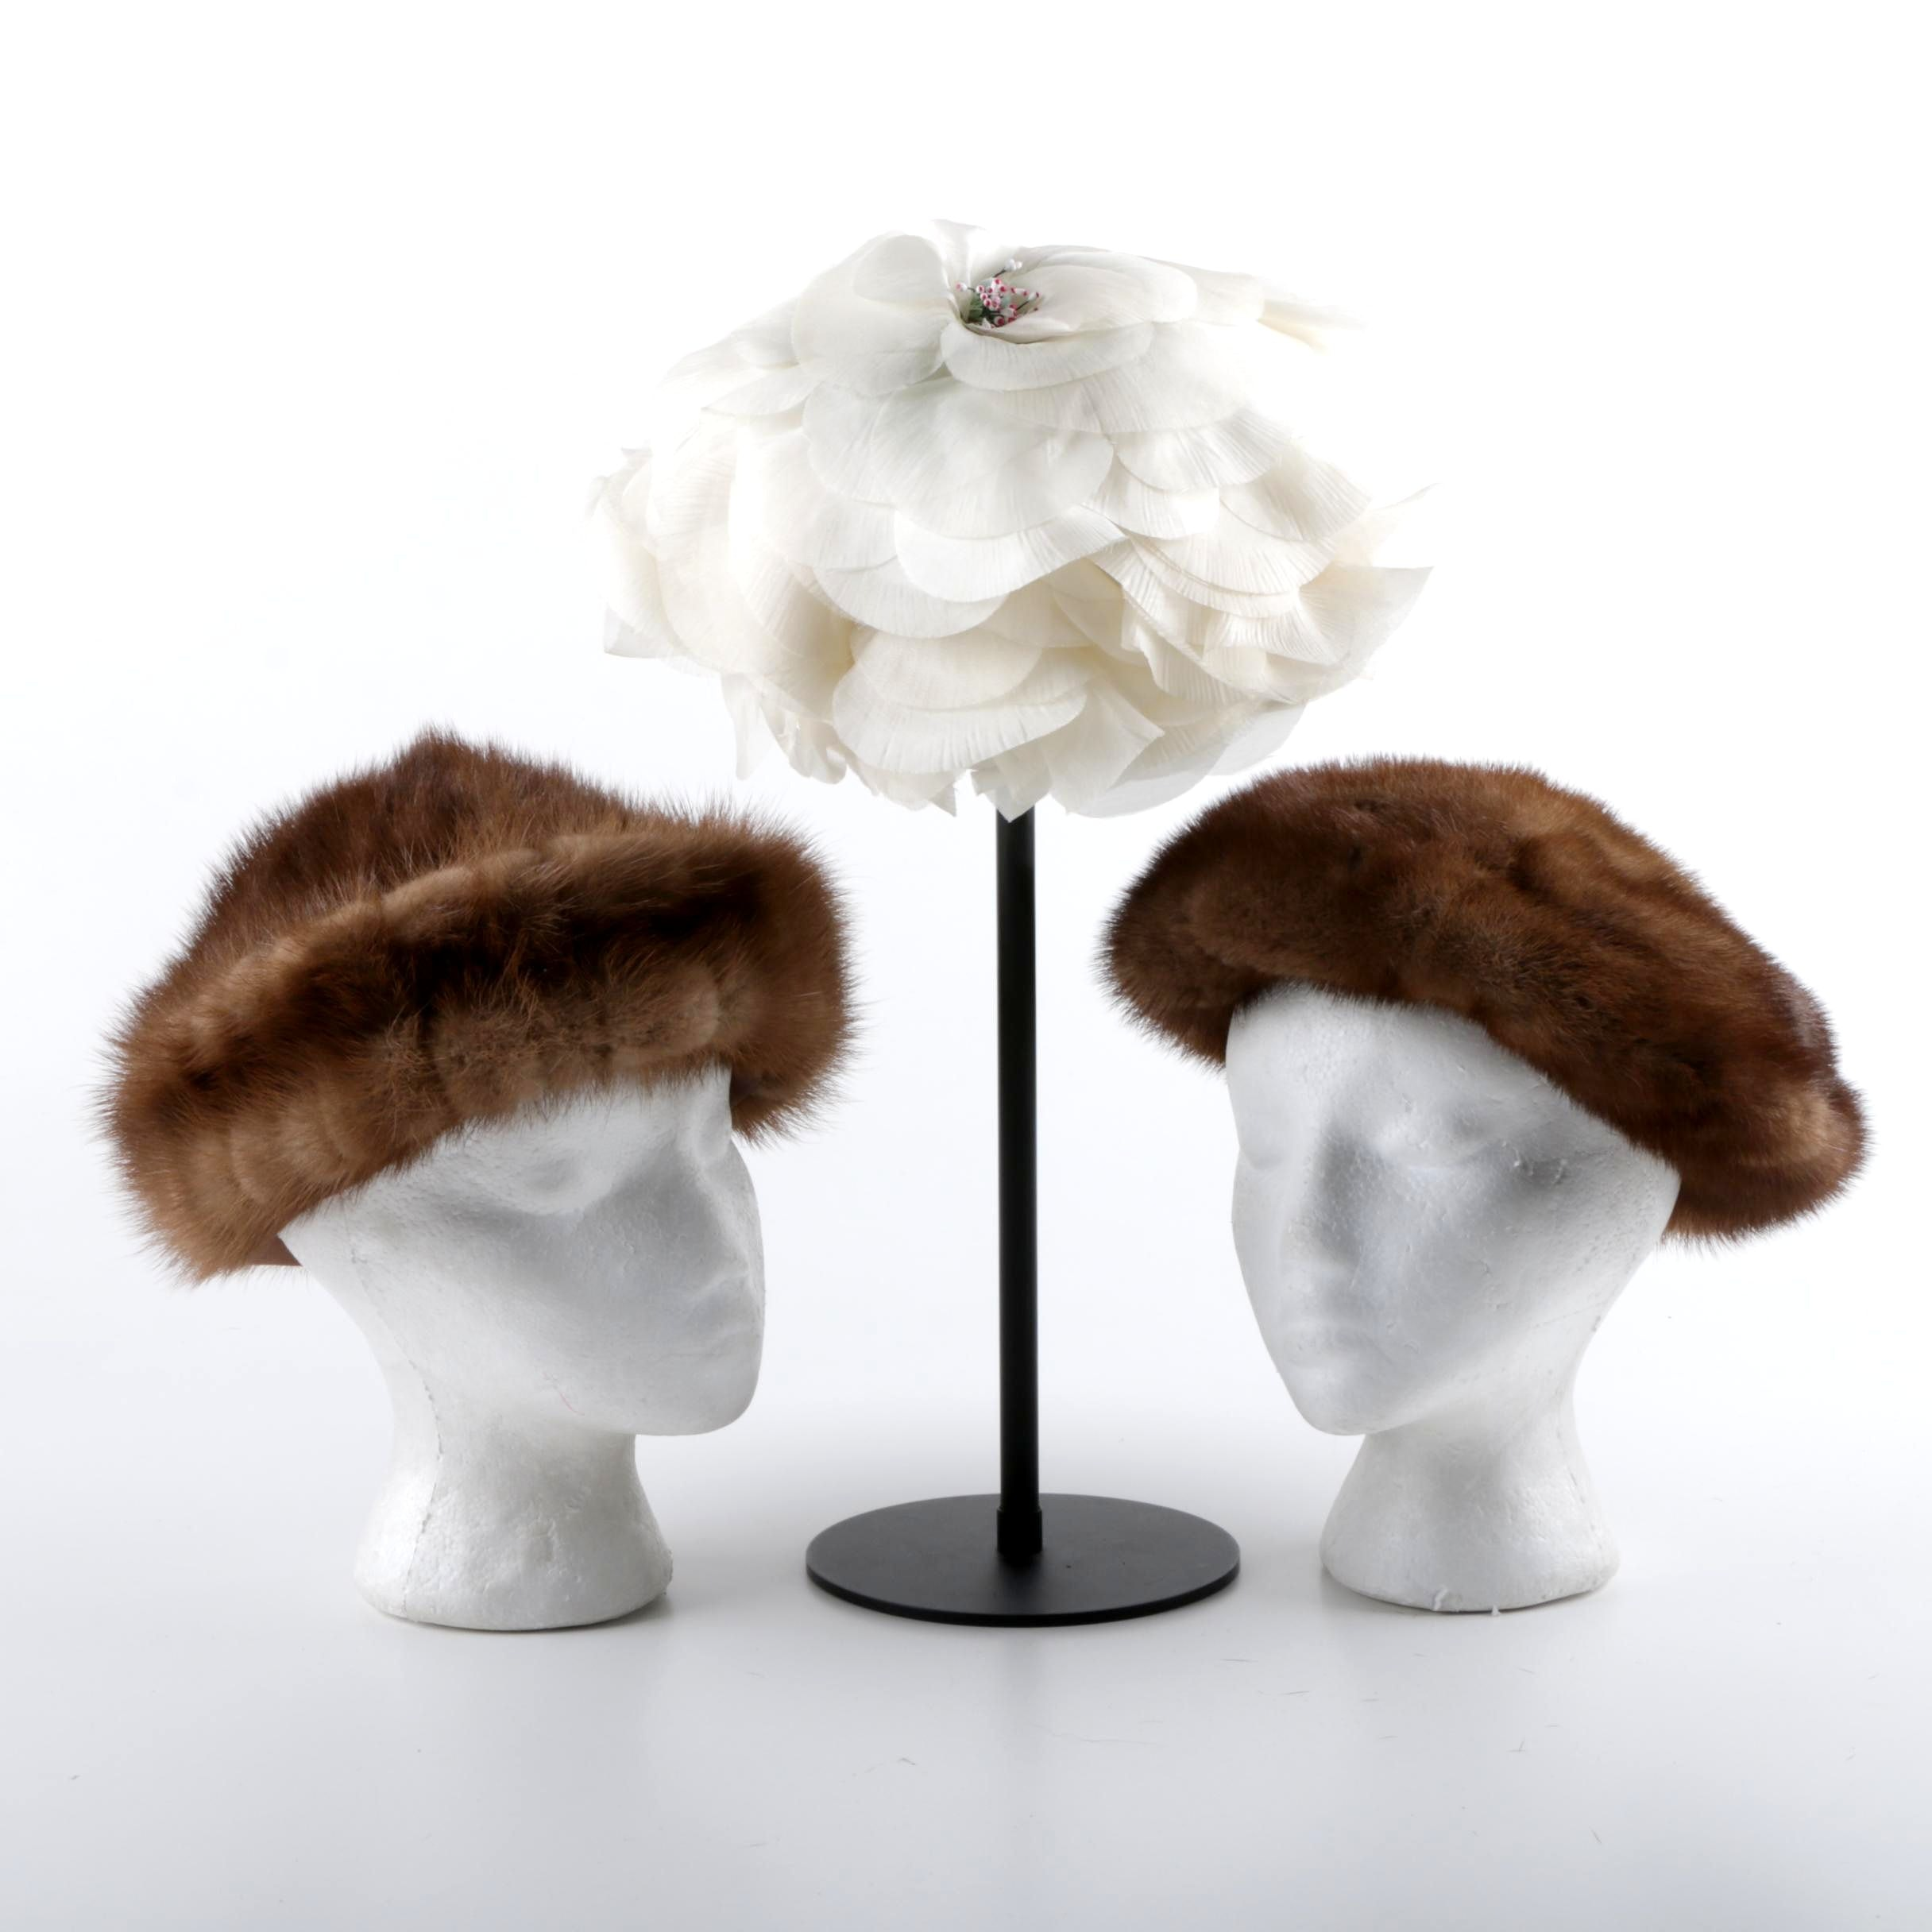 Women's Vintage Hats Including Mink Fur Hats